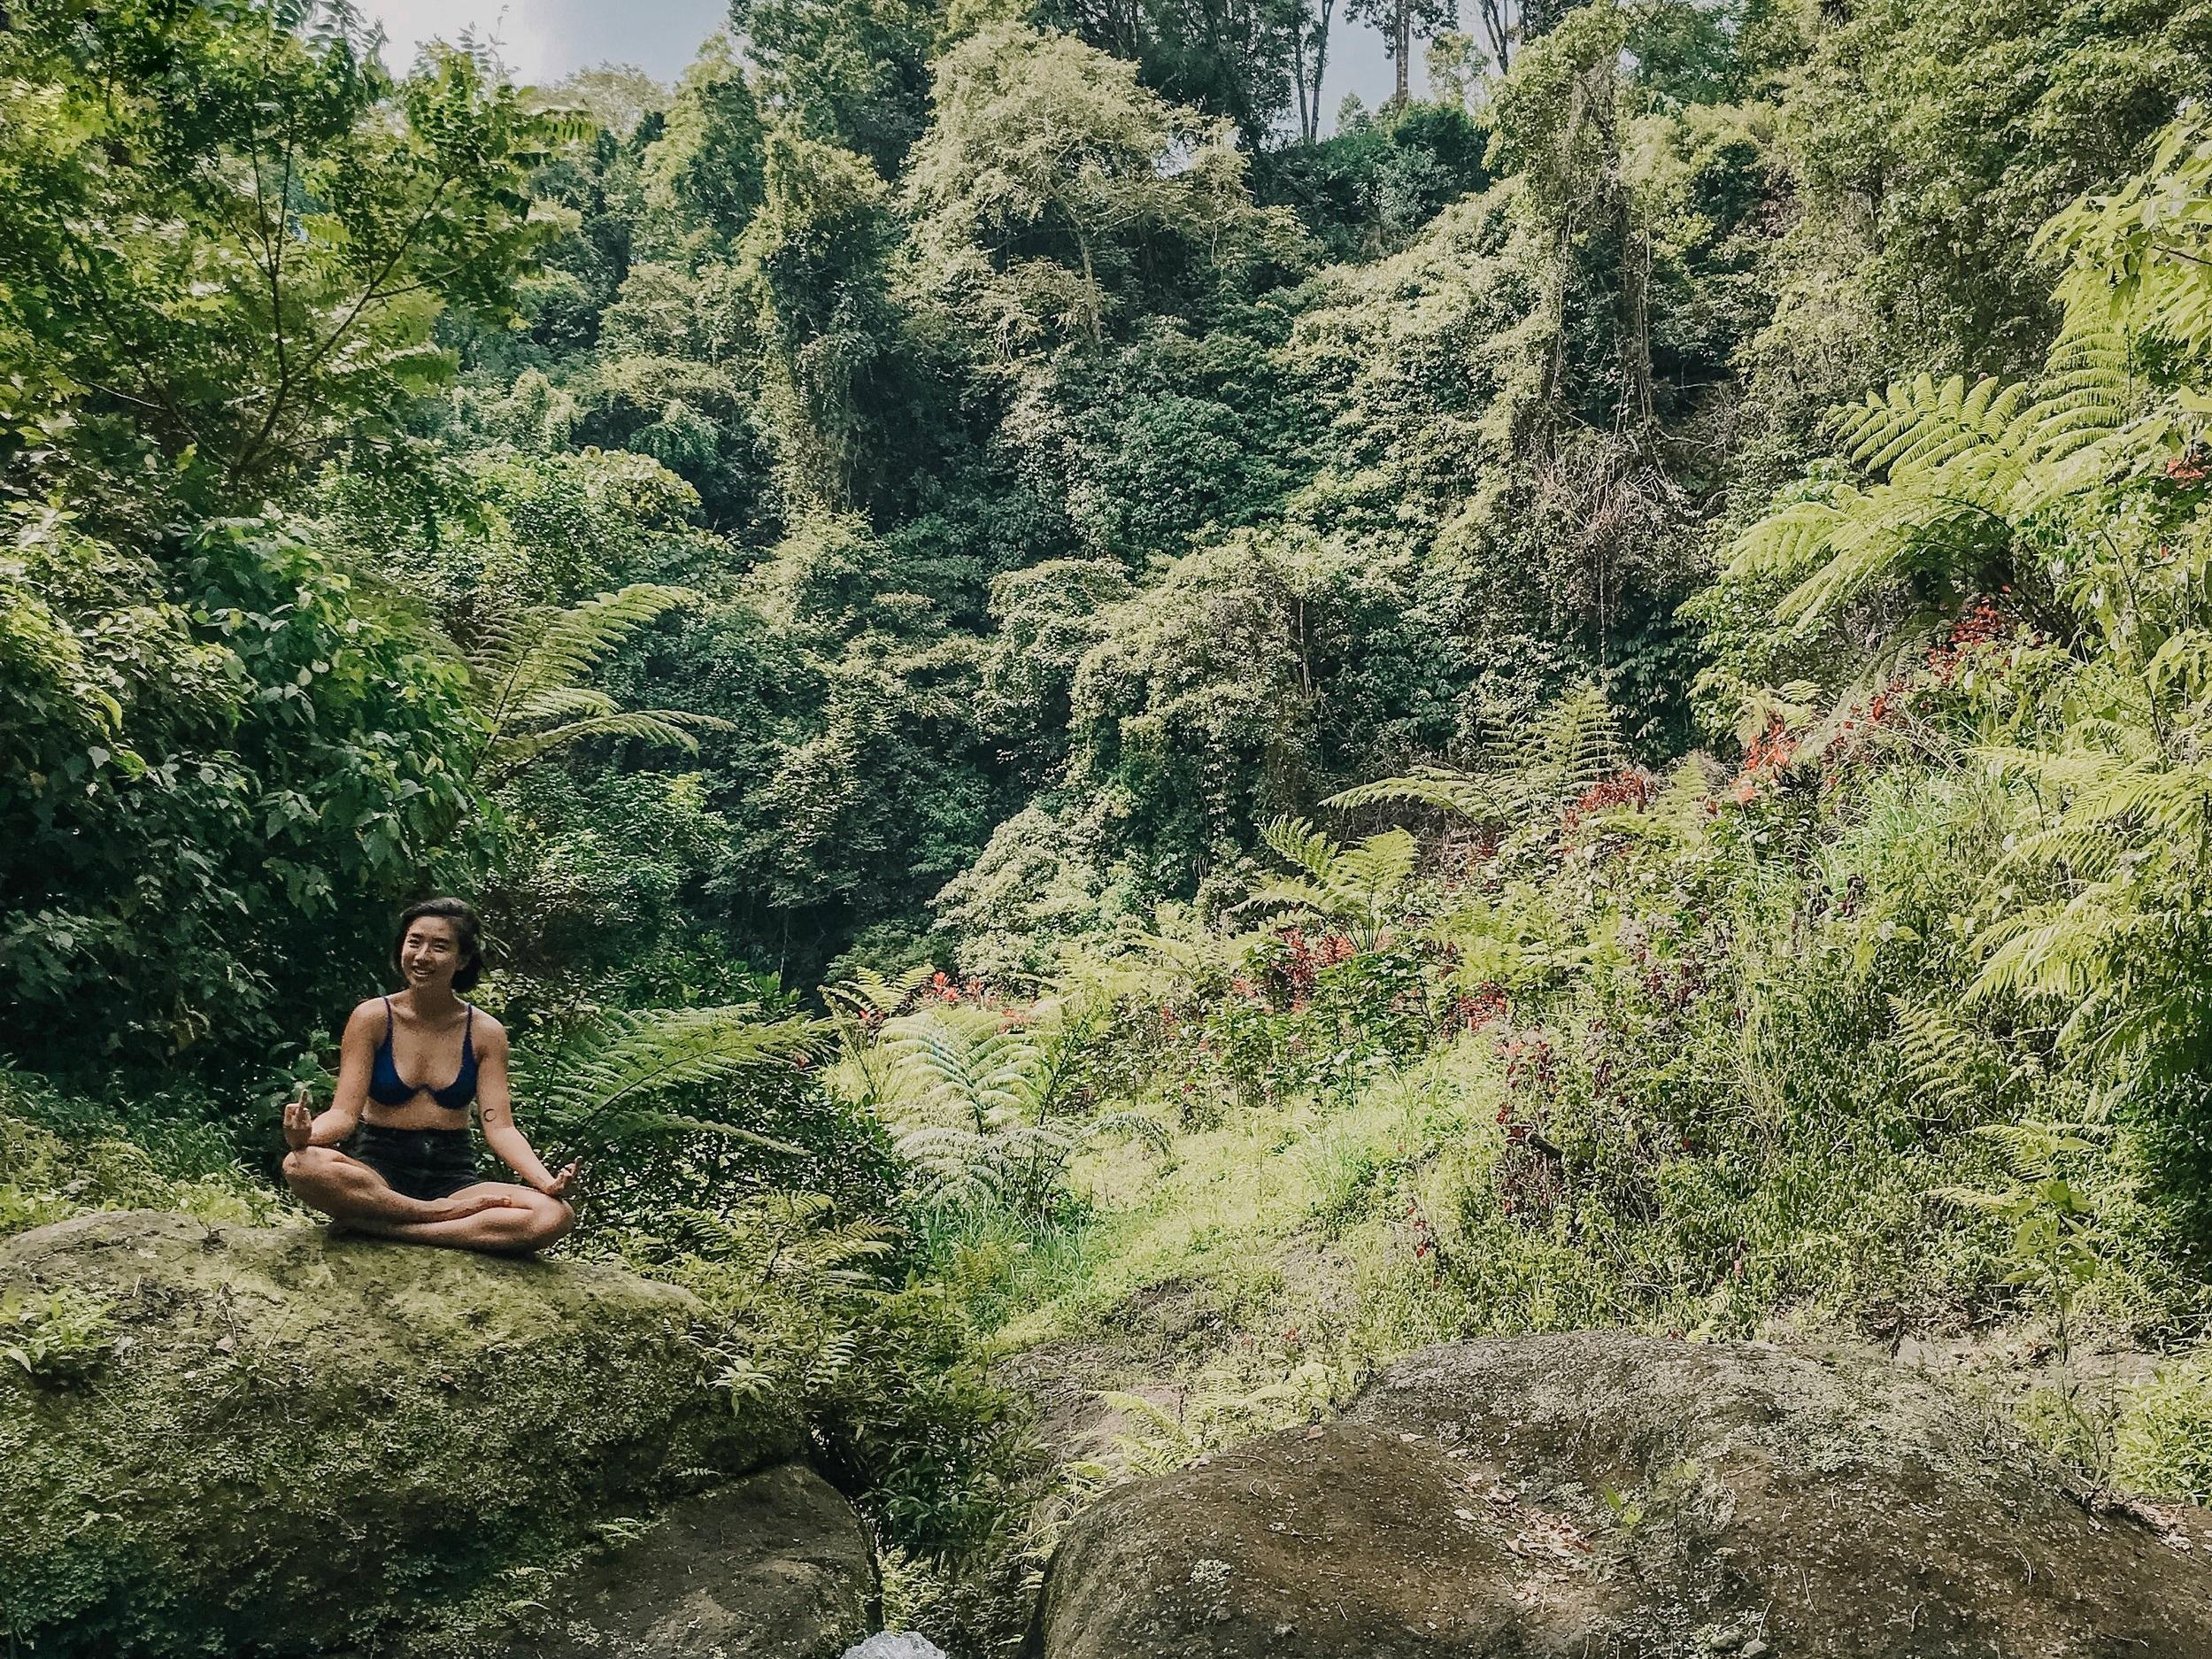 anytiffng-spirituality